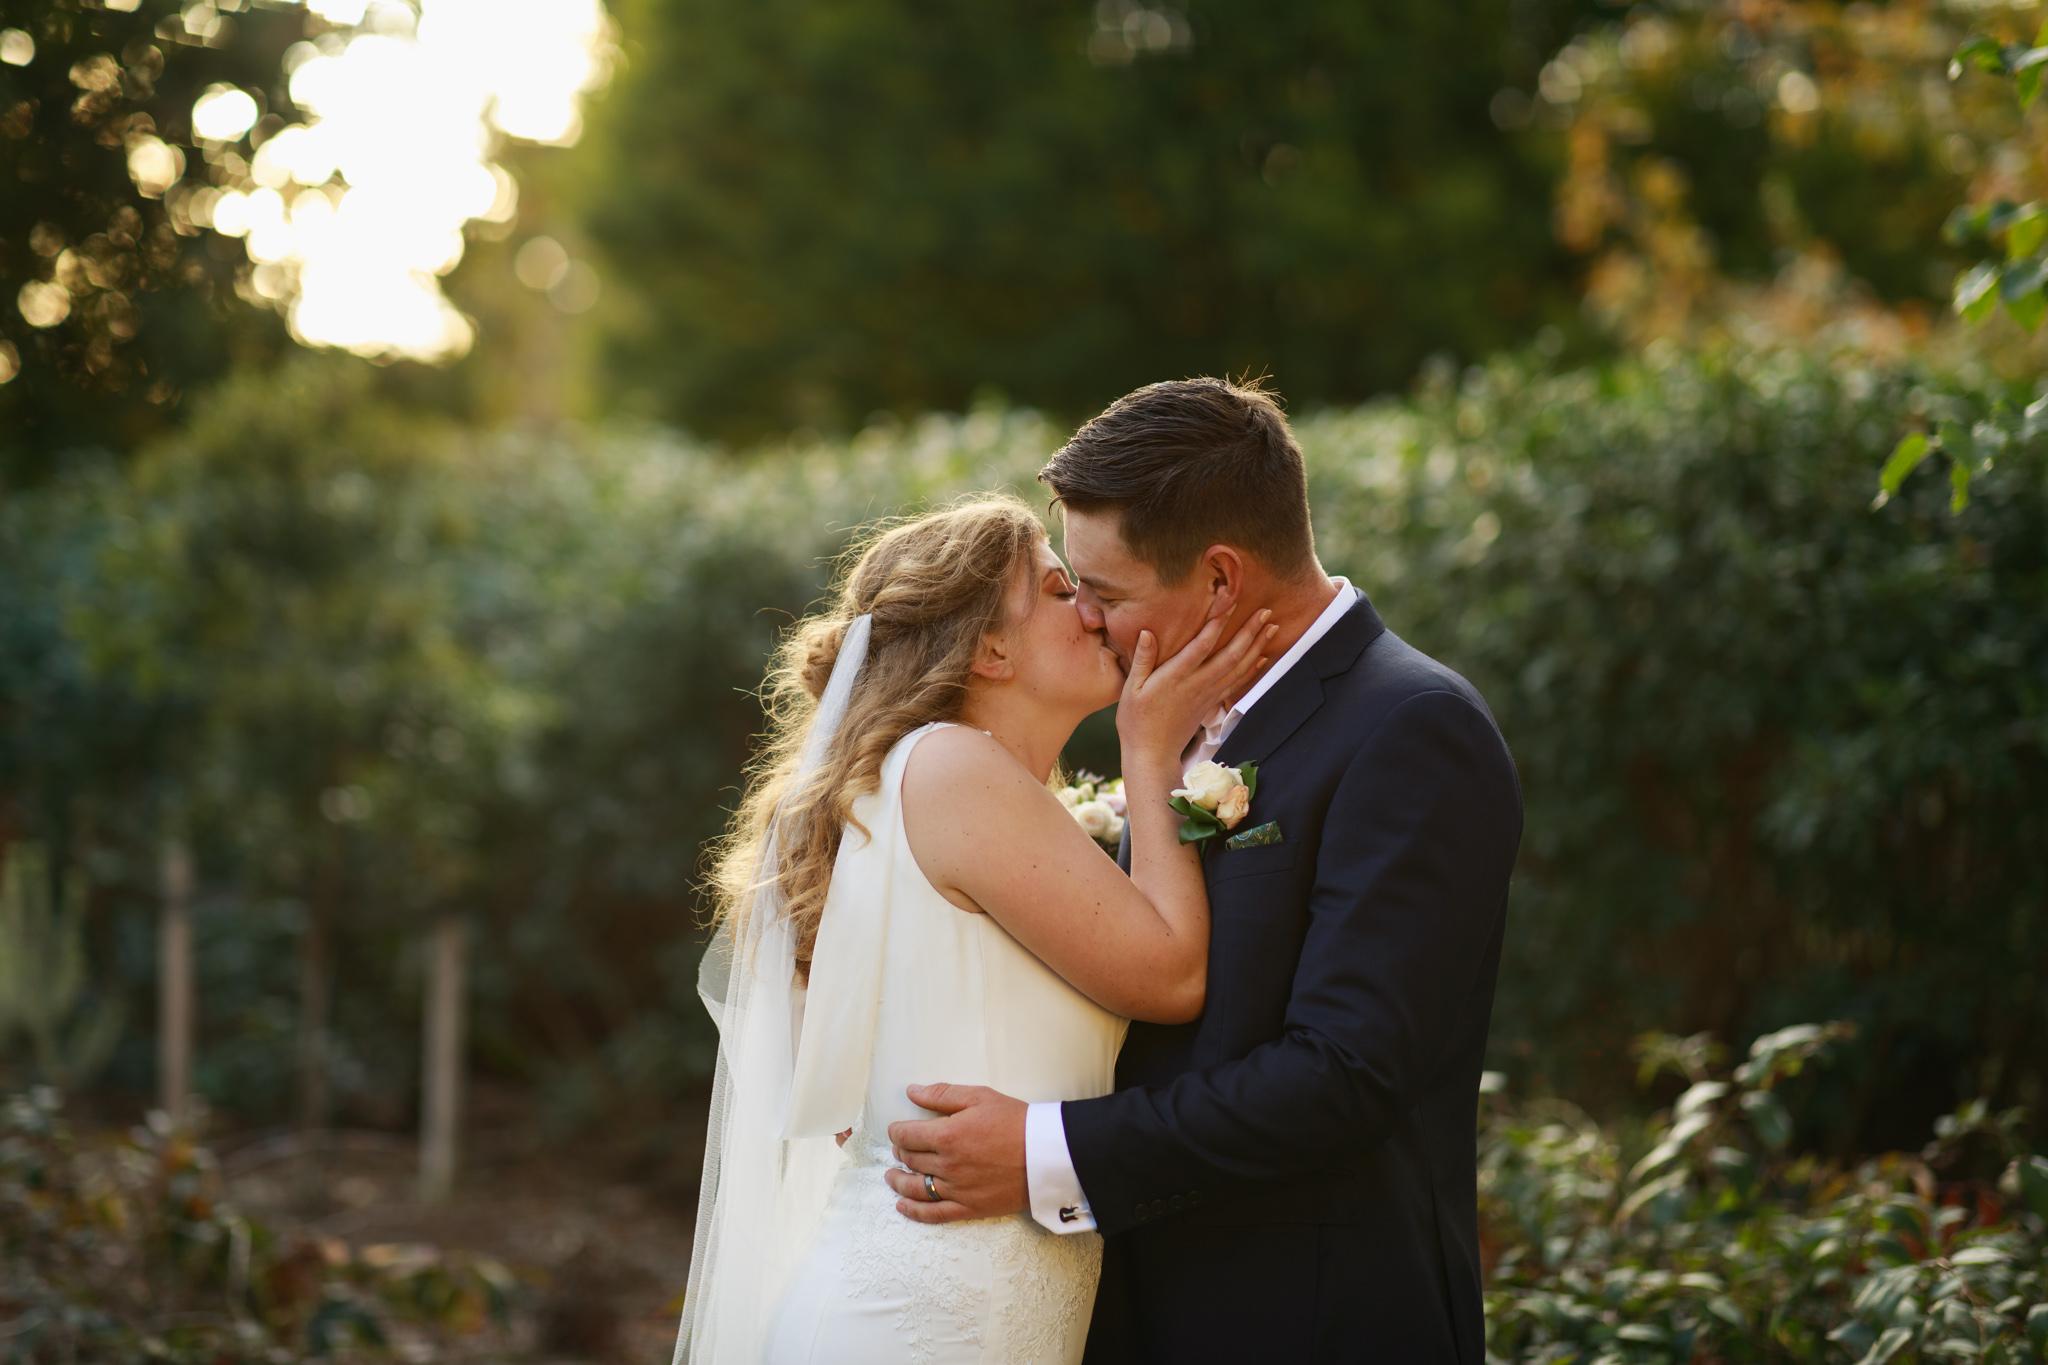 palmerston-north-wedding-photography-caccia-birch-highlight-new-zealand